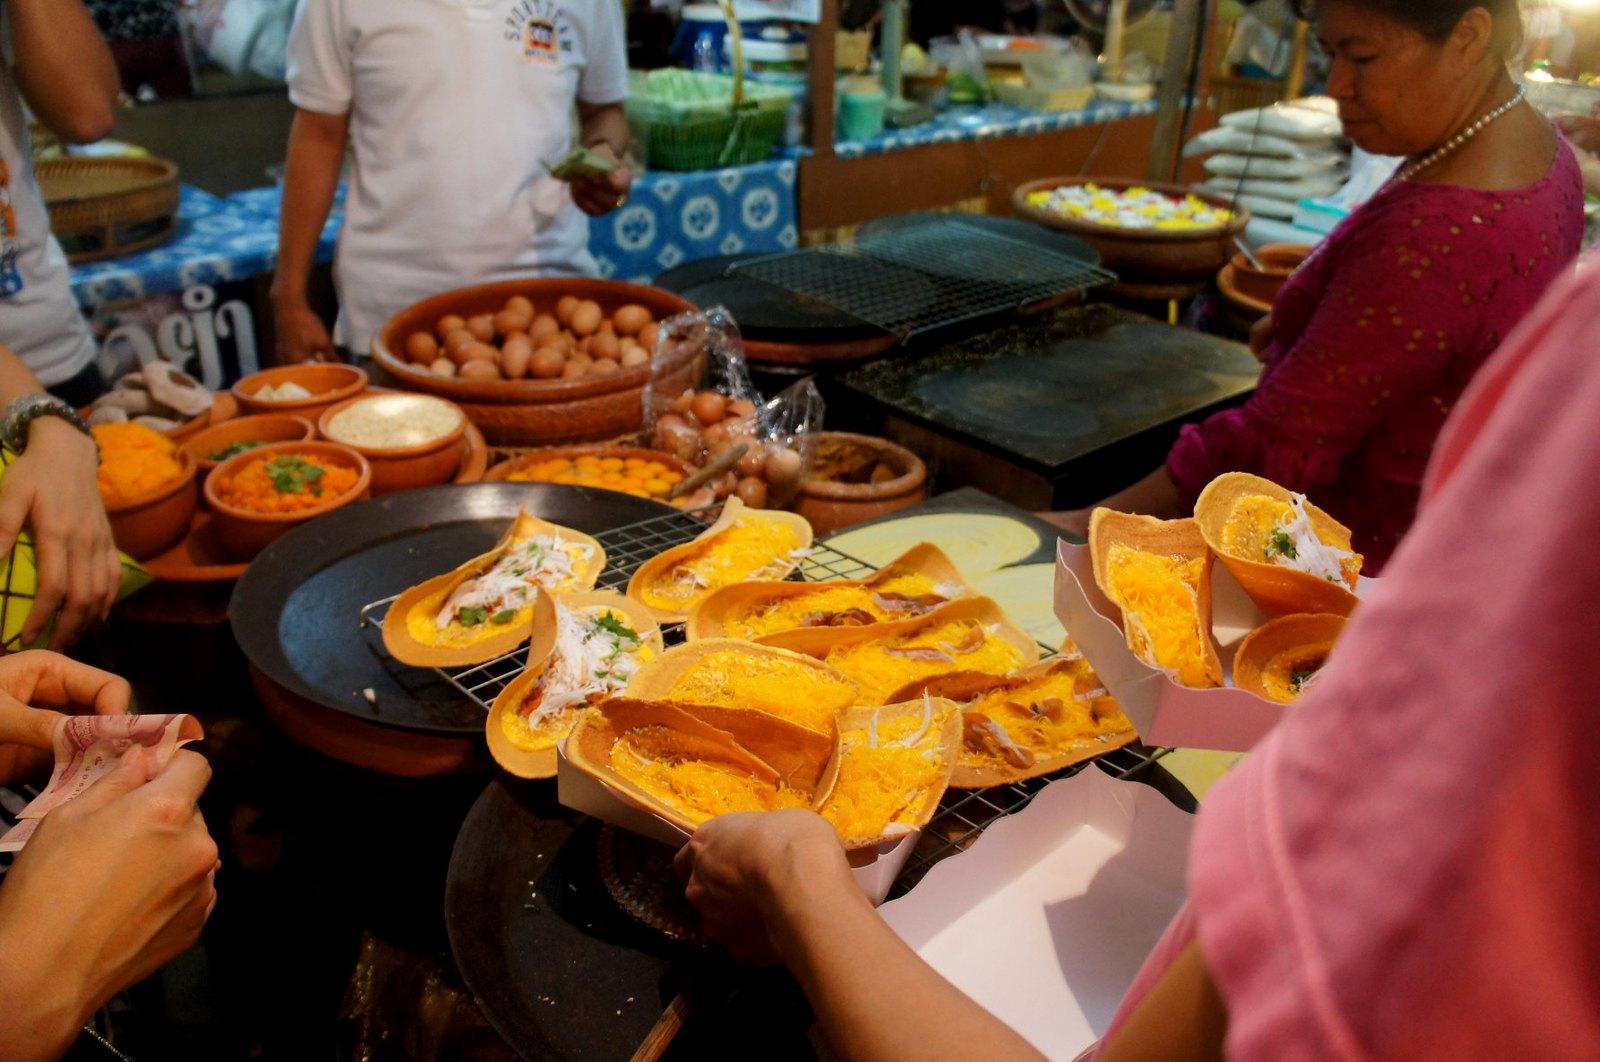 Omelette wraps